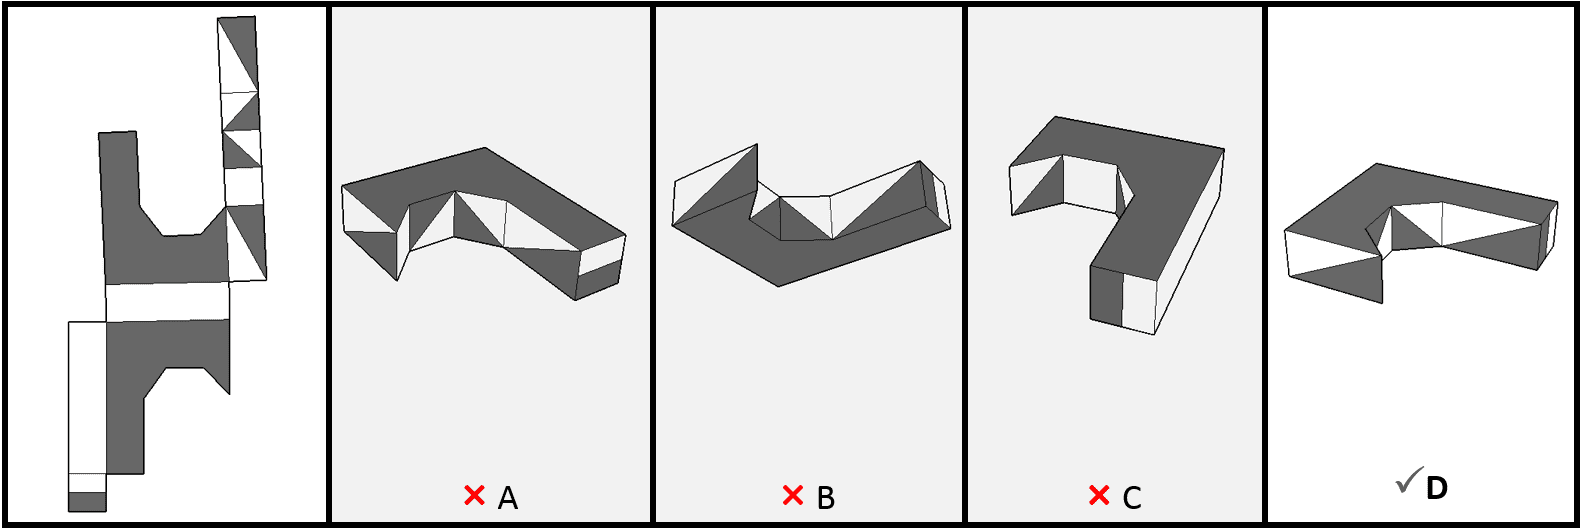 Pattern Folding18_post